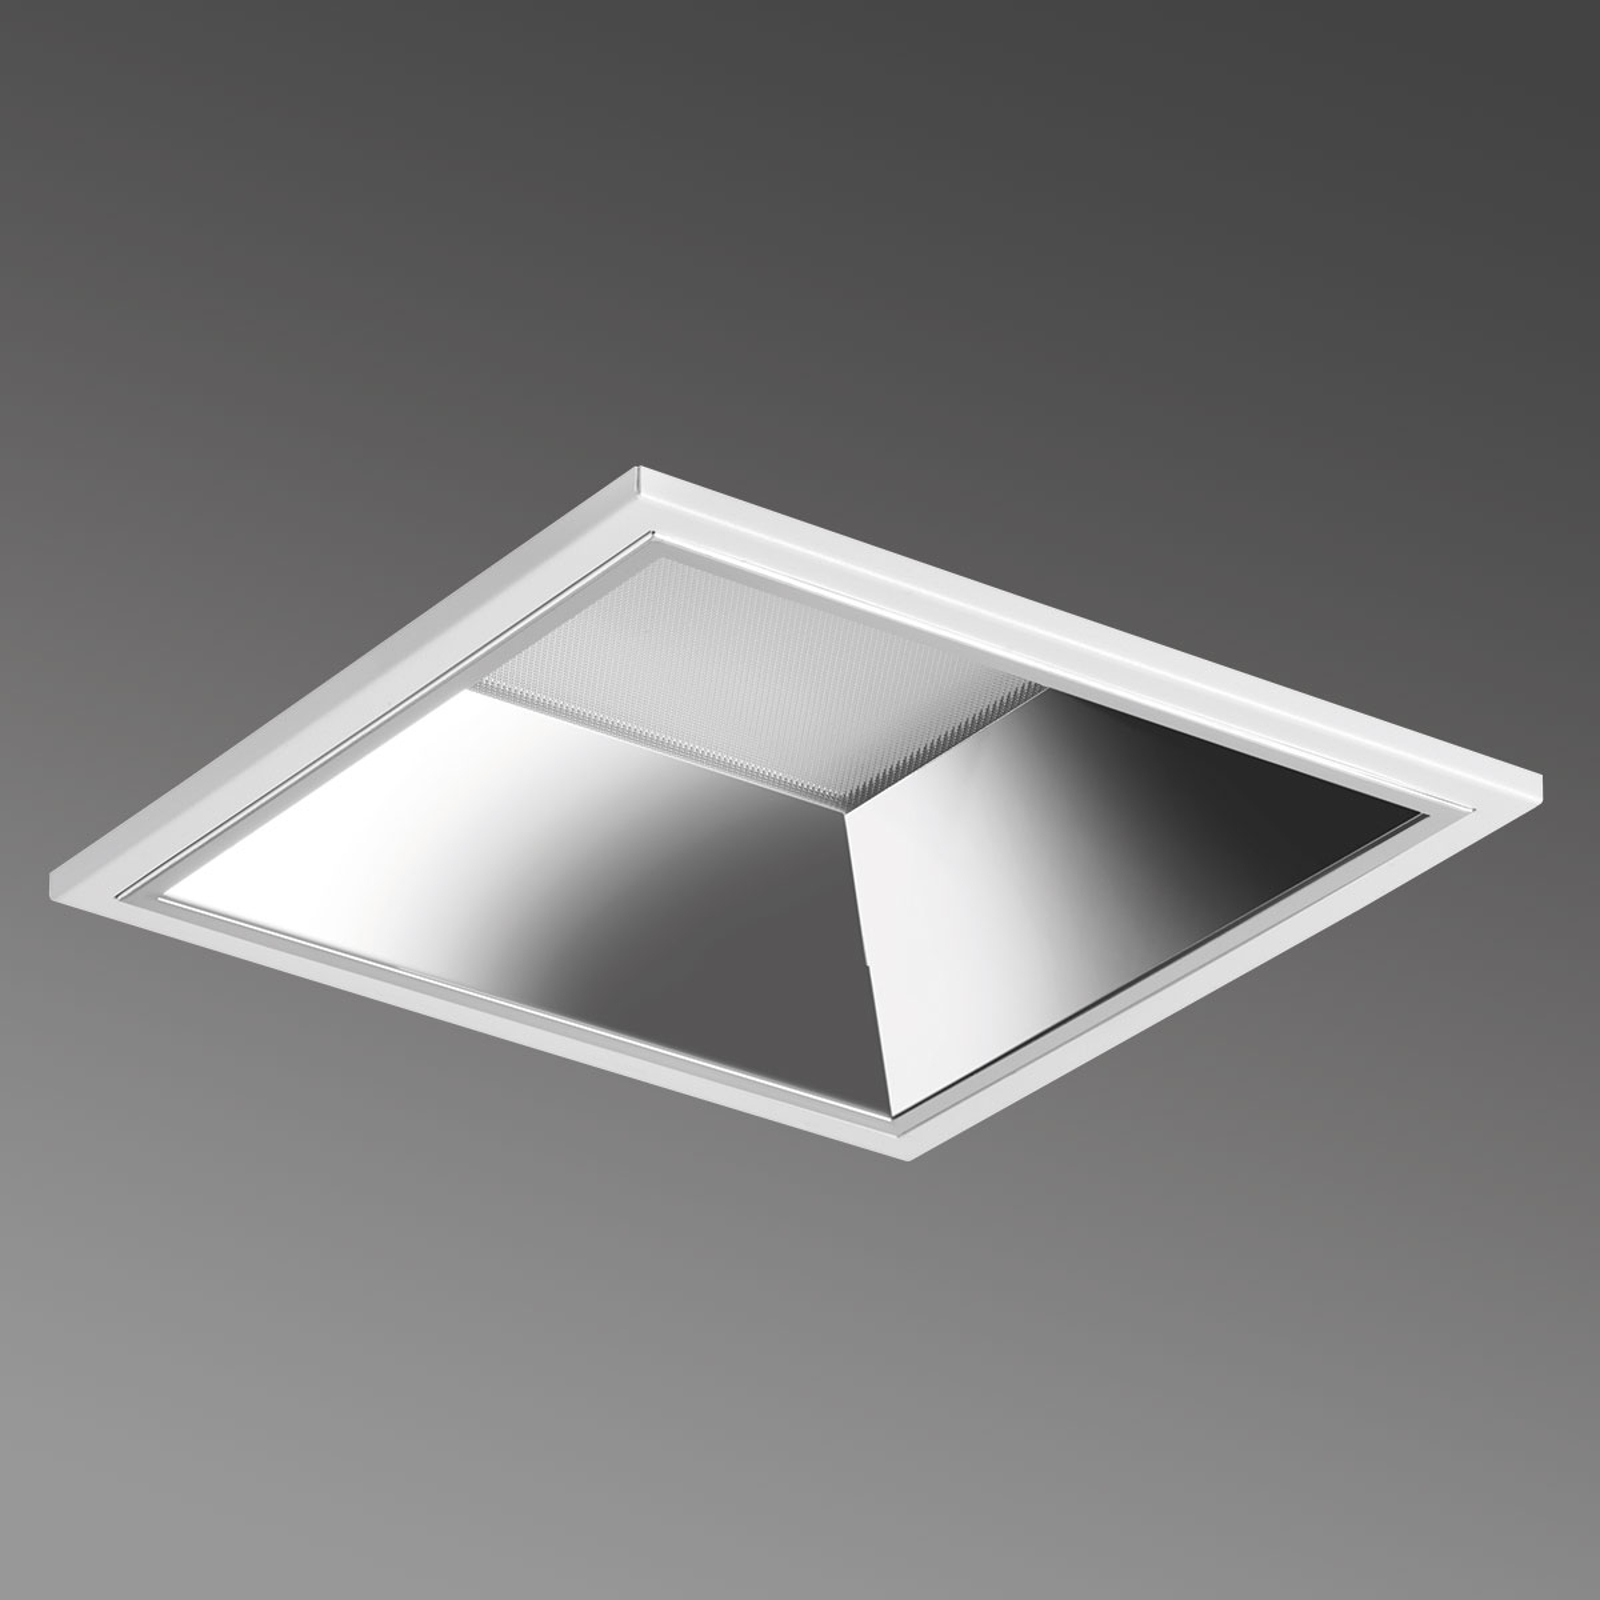 LED-Einbauleuche Noviel L PRE 85°, 33W, 3.000K